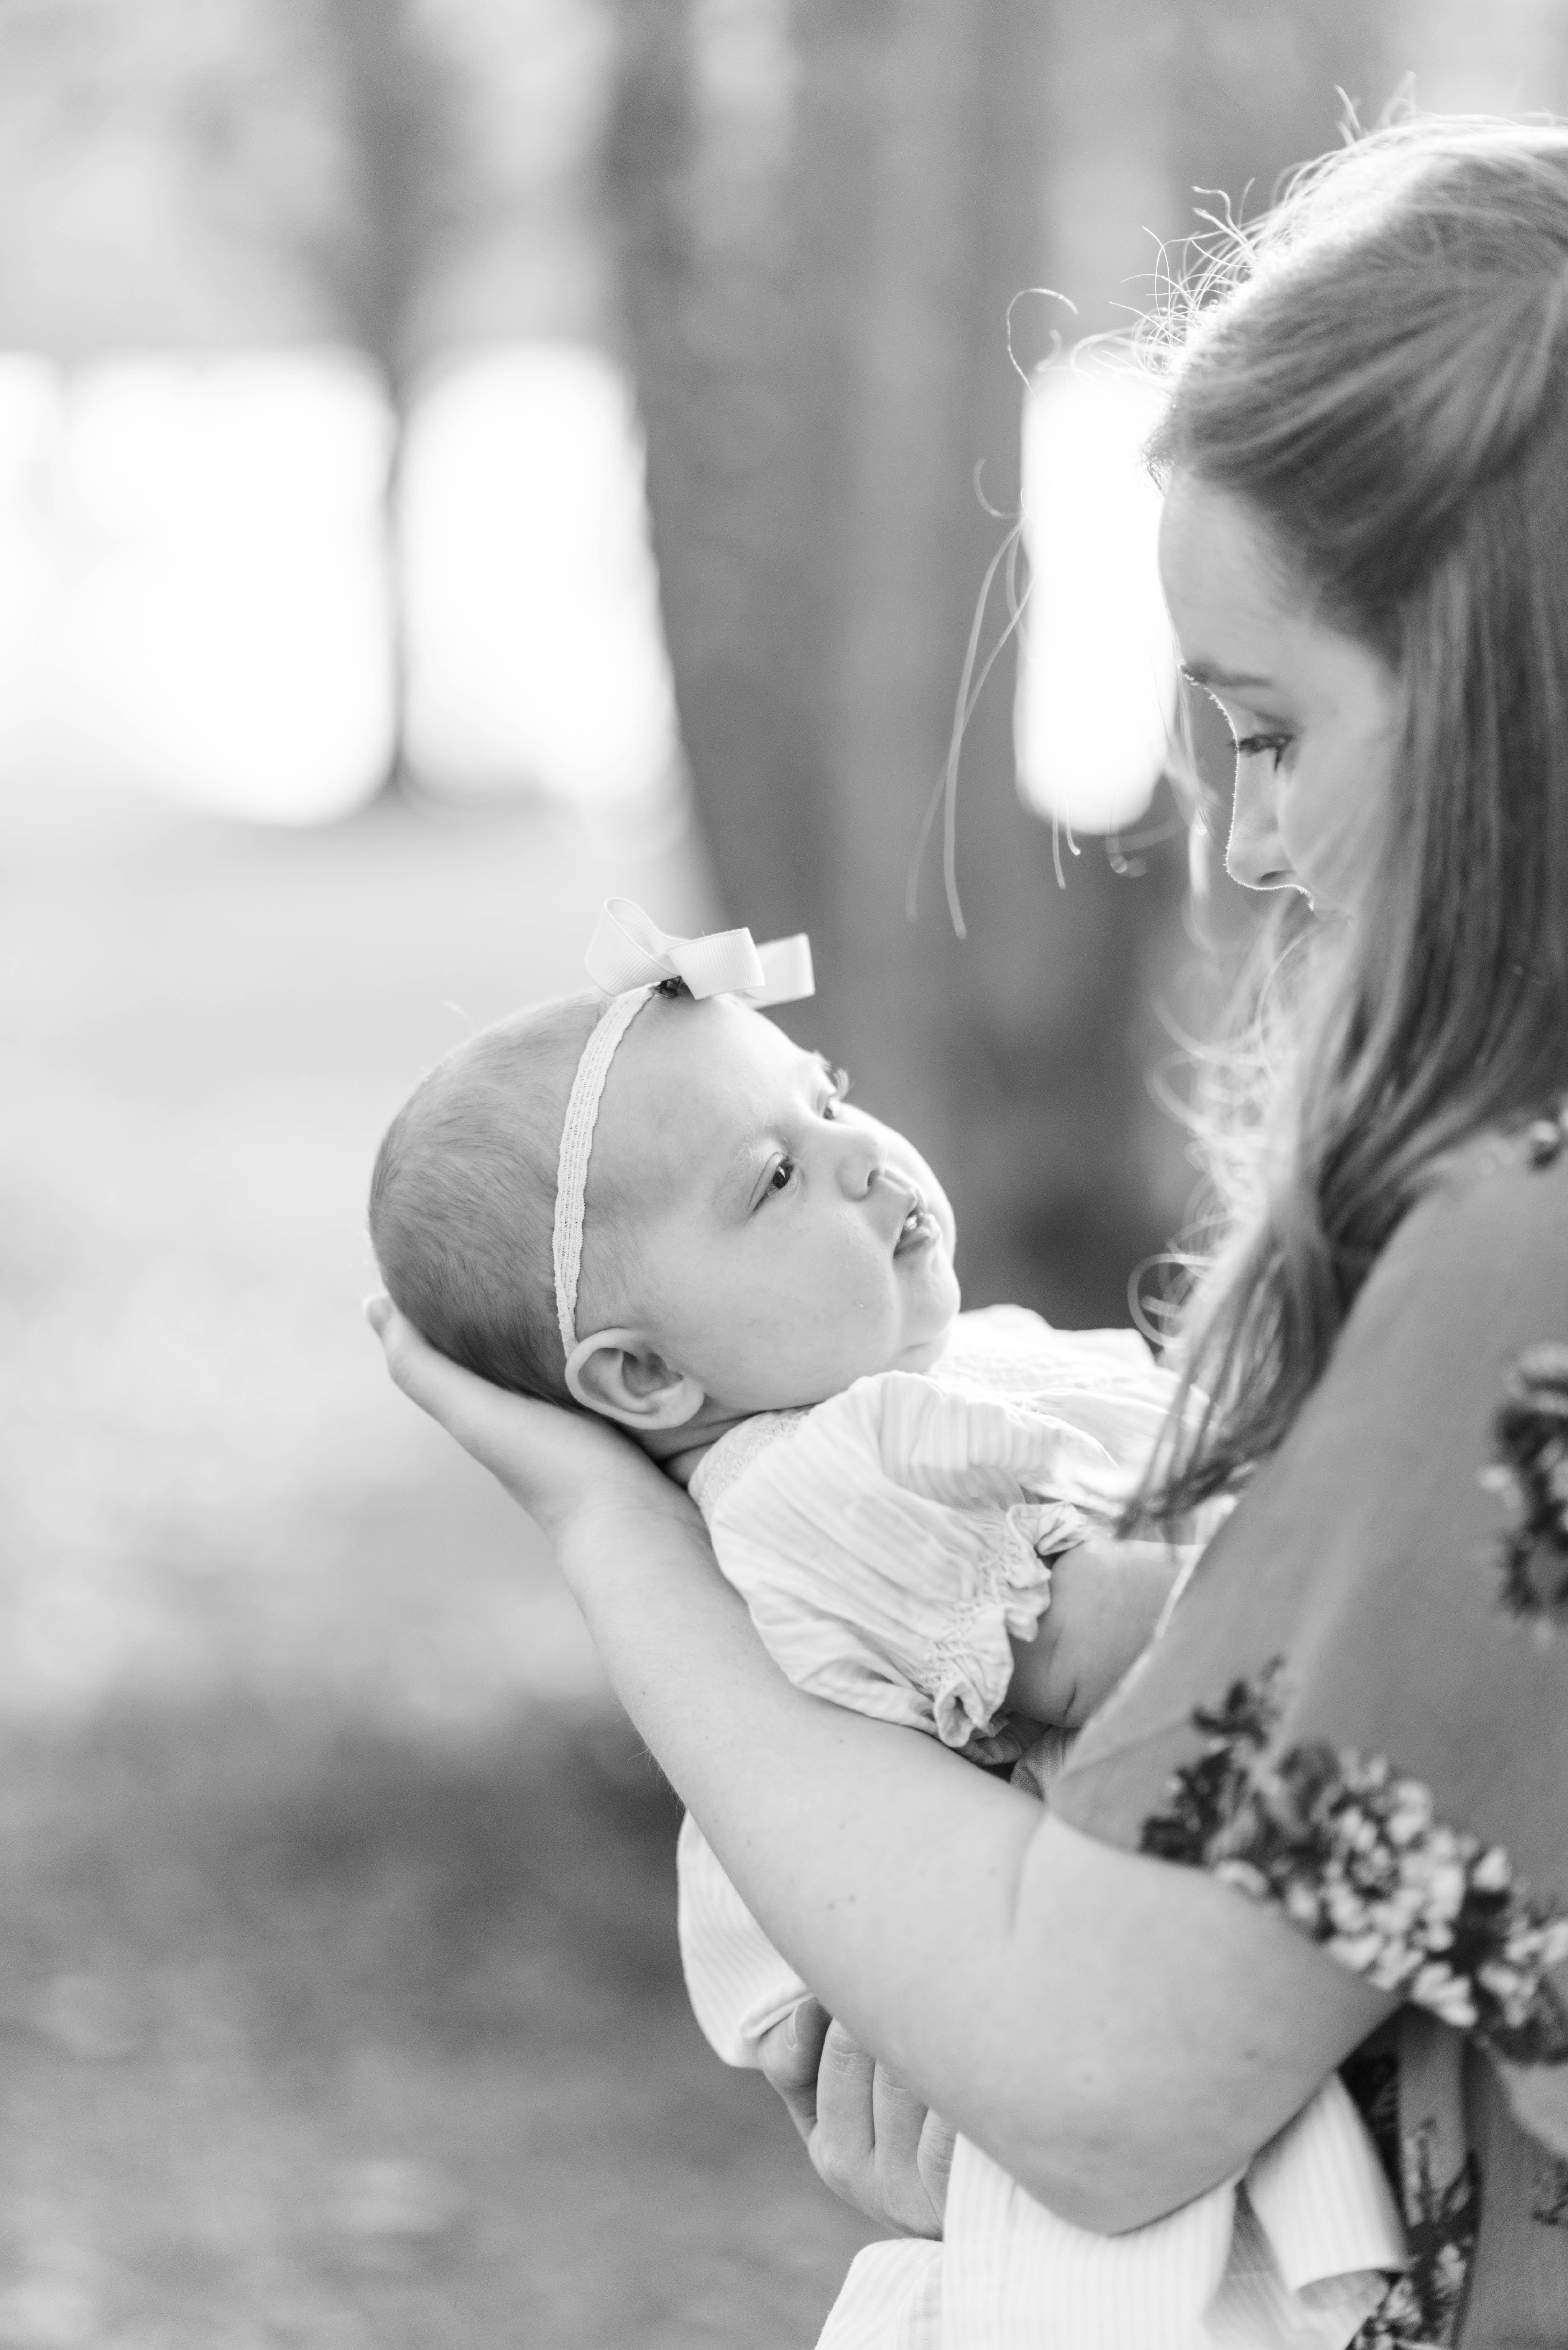 Mom with postpartum depression